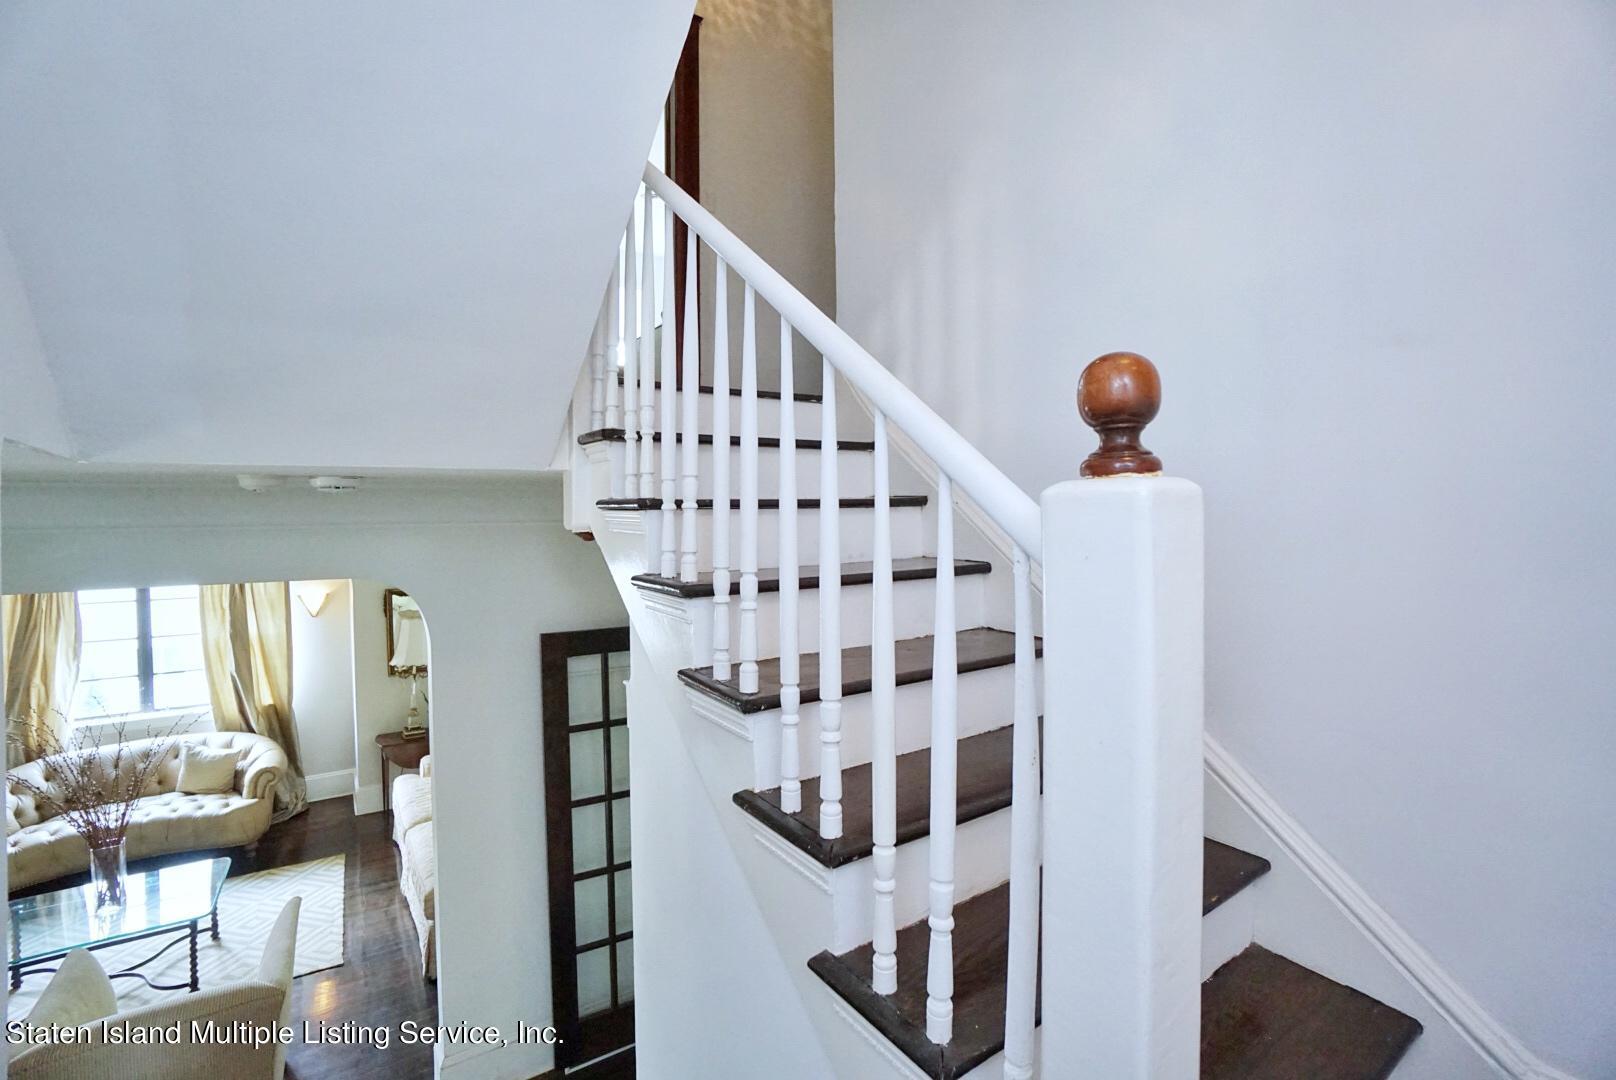 Single Family - Detached 311 Bement Avenue  Staten Island, NY 10310, MLS-1147133-19